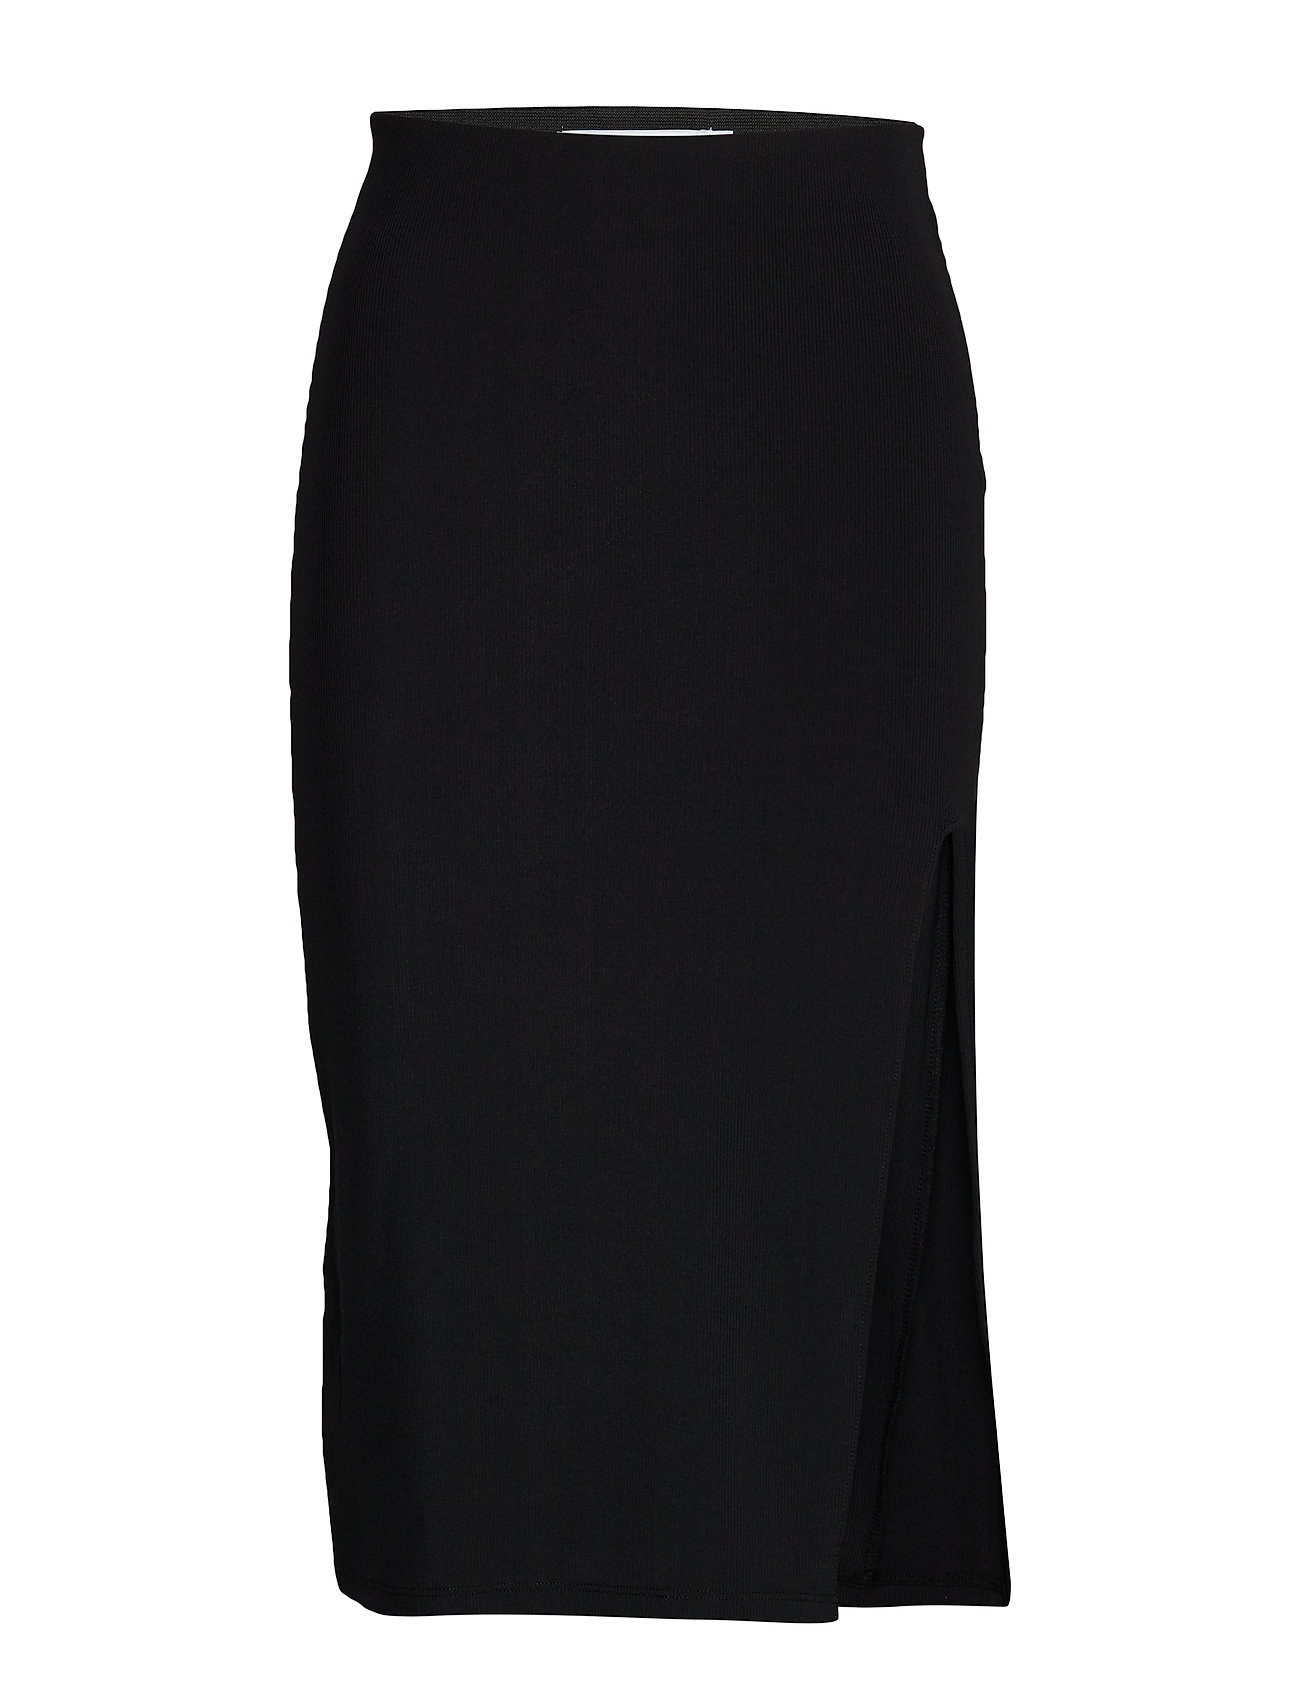 Ivyrevel RIB SLIT SKIRT - BLACK